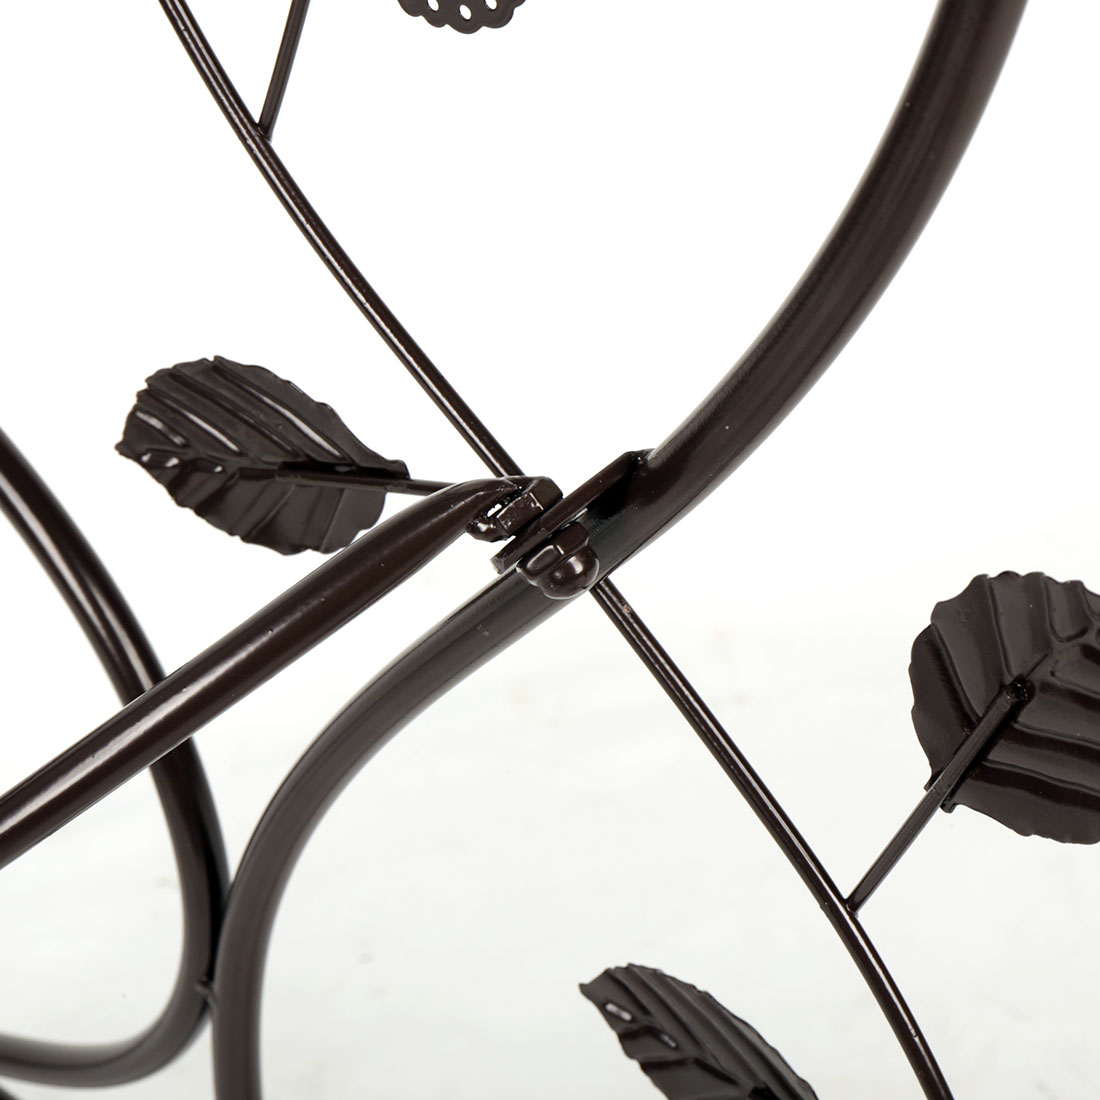 3 Tier Metal Plant Stand Flower Pot Display Rack Holder